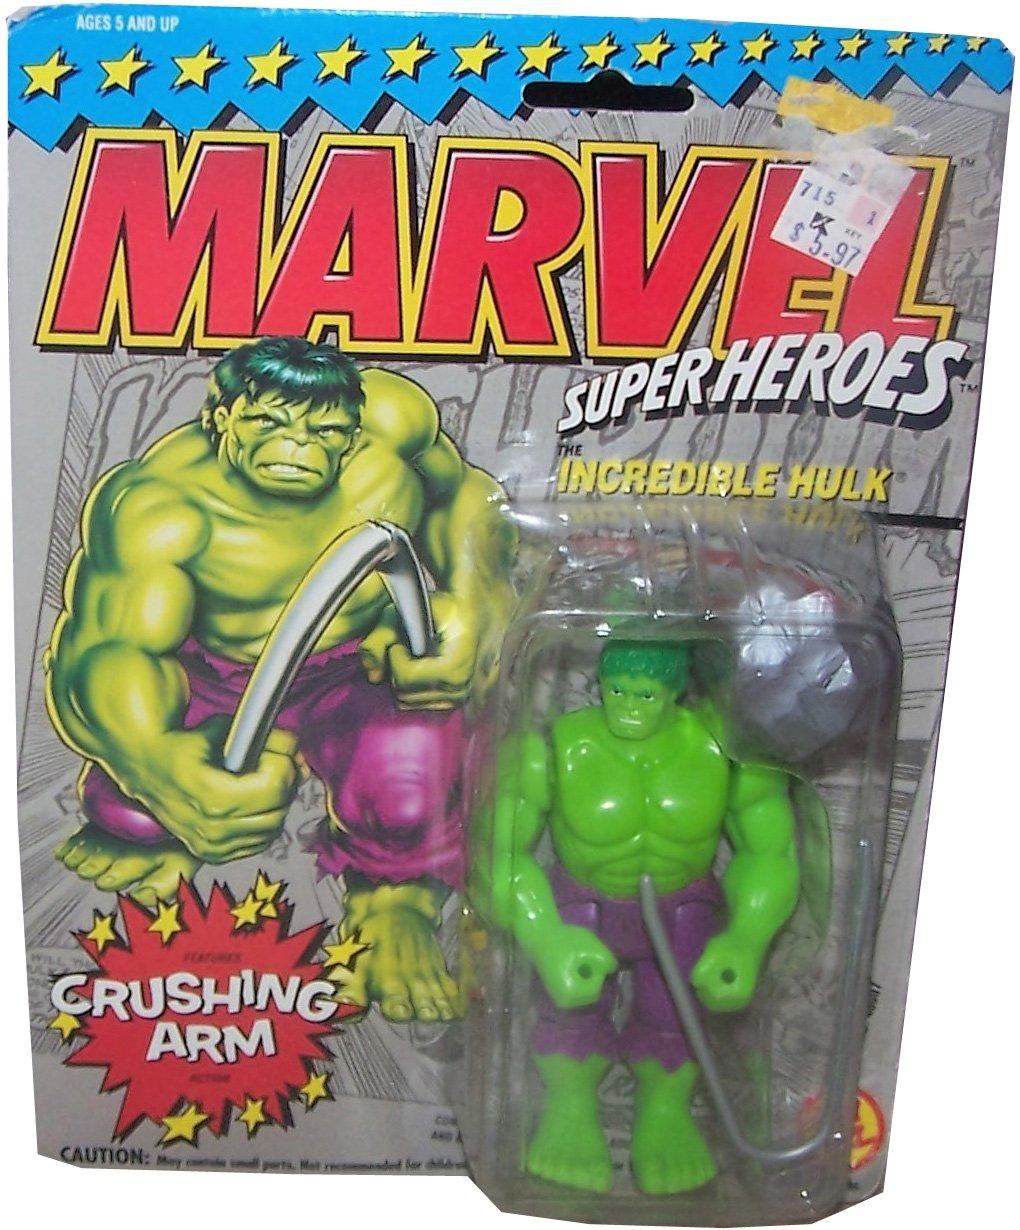 Vintage MARVEL Super Heroes Actionfigur: HULK - Crushing Arm!